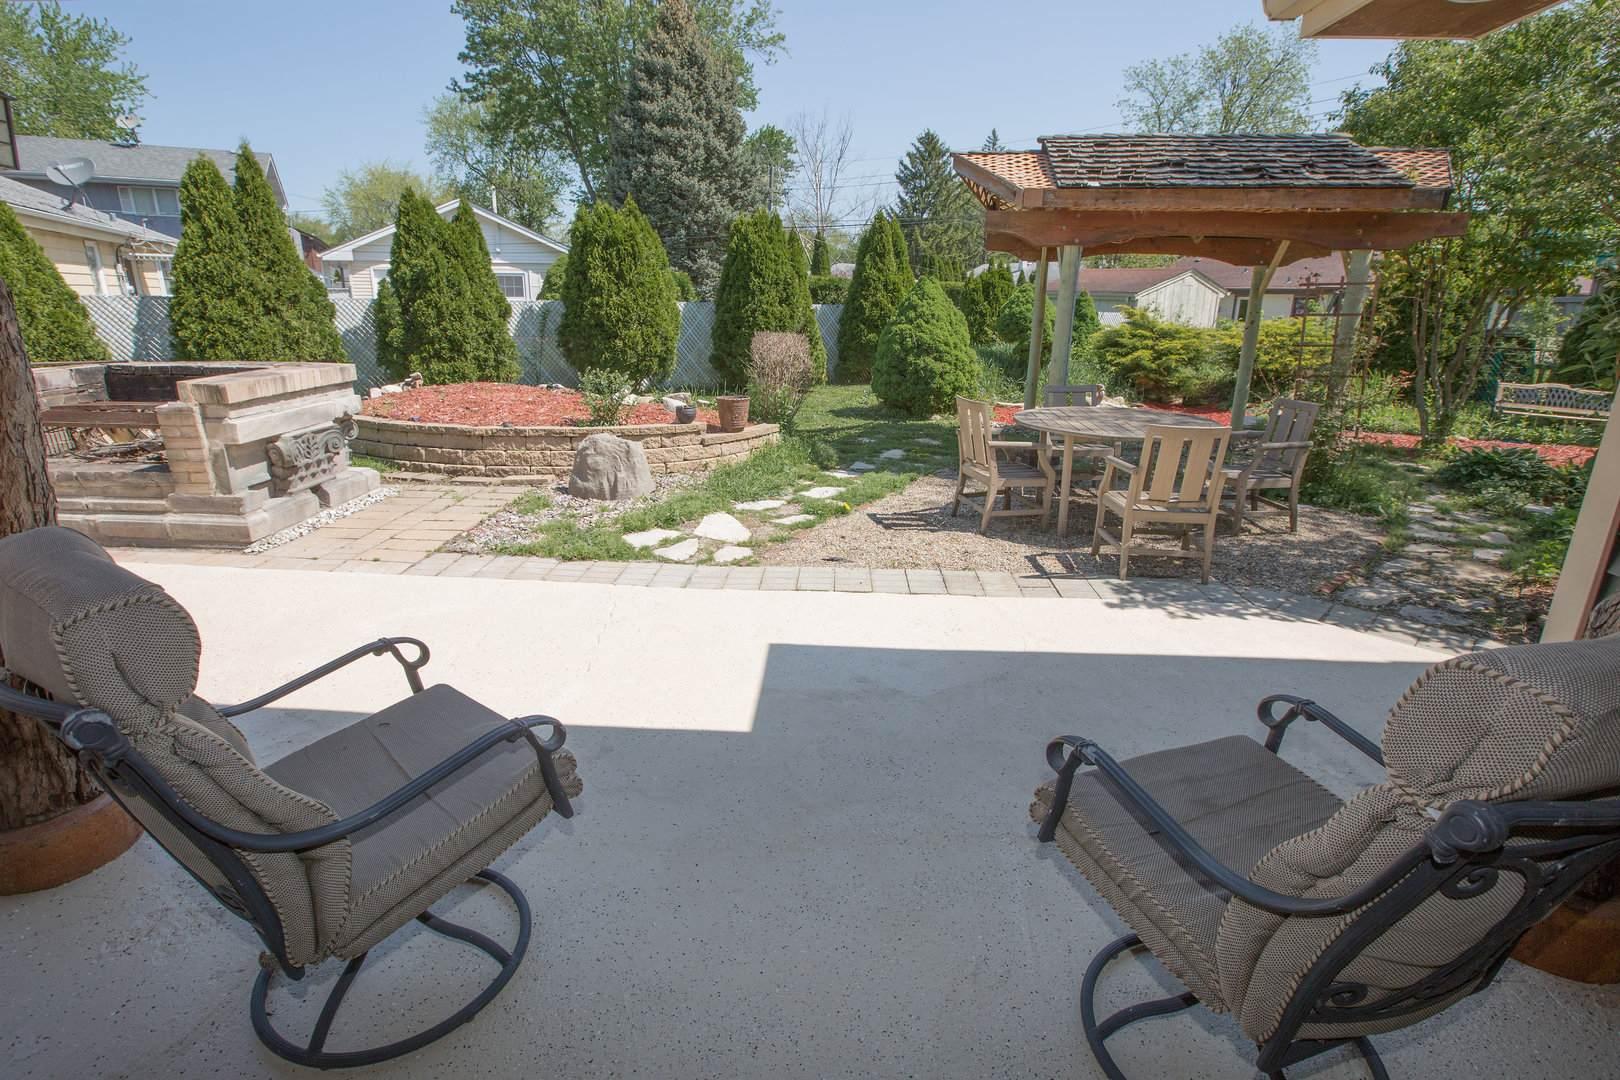 11649 S Natchez Avenue, Worth, IL 60482 (MLS #10862090) :: John Lyons Real Estate